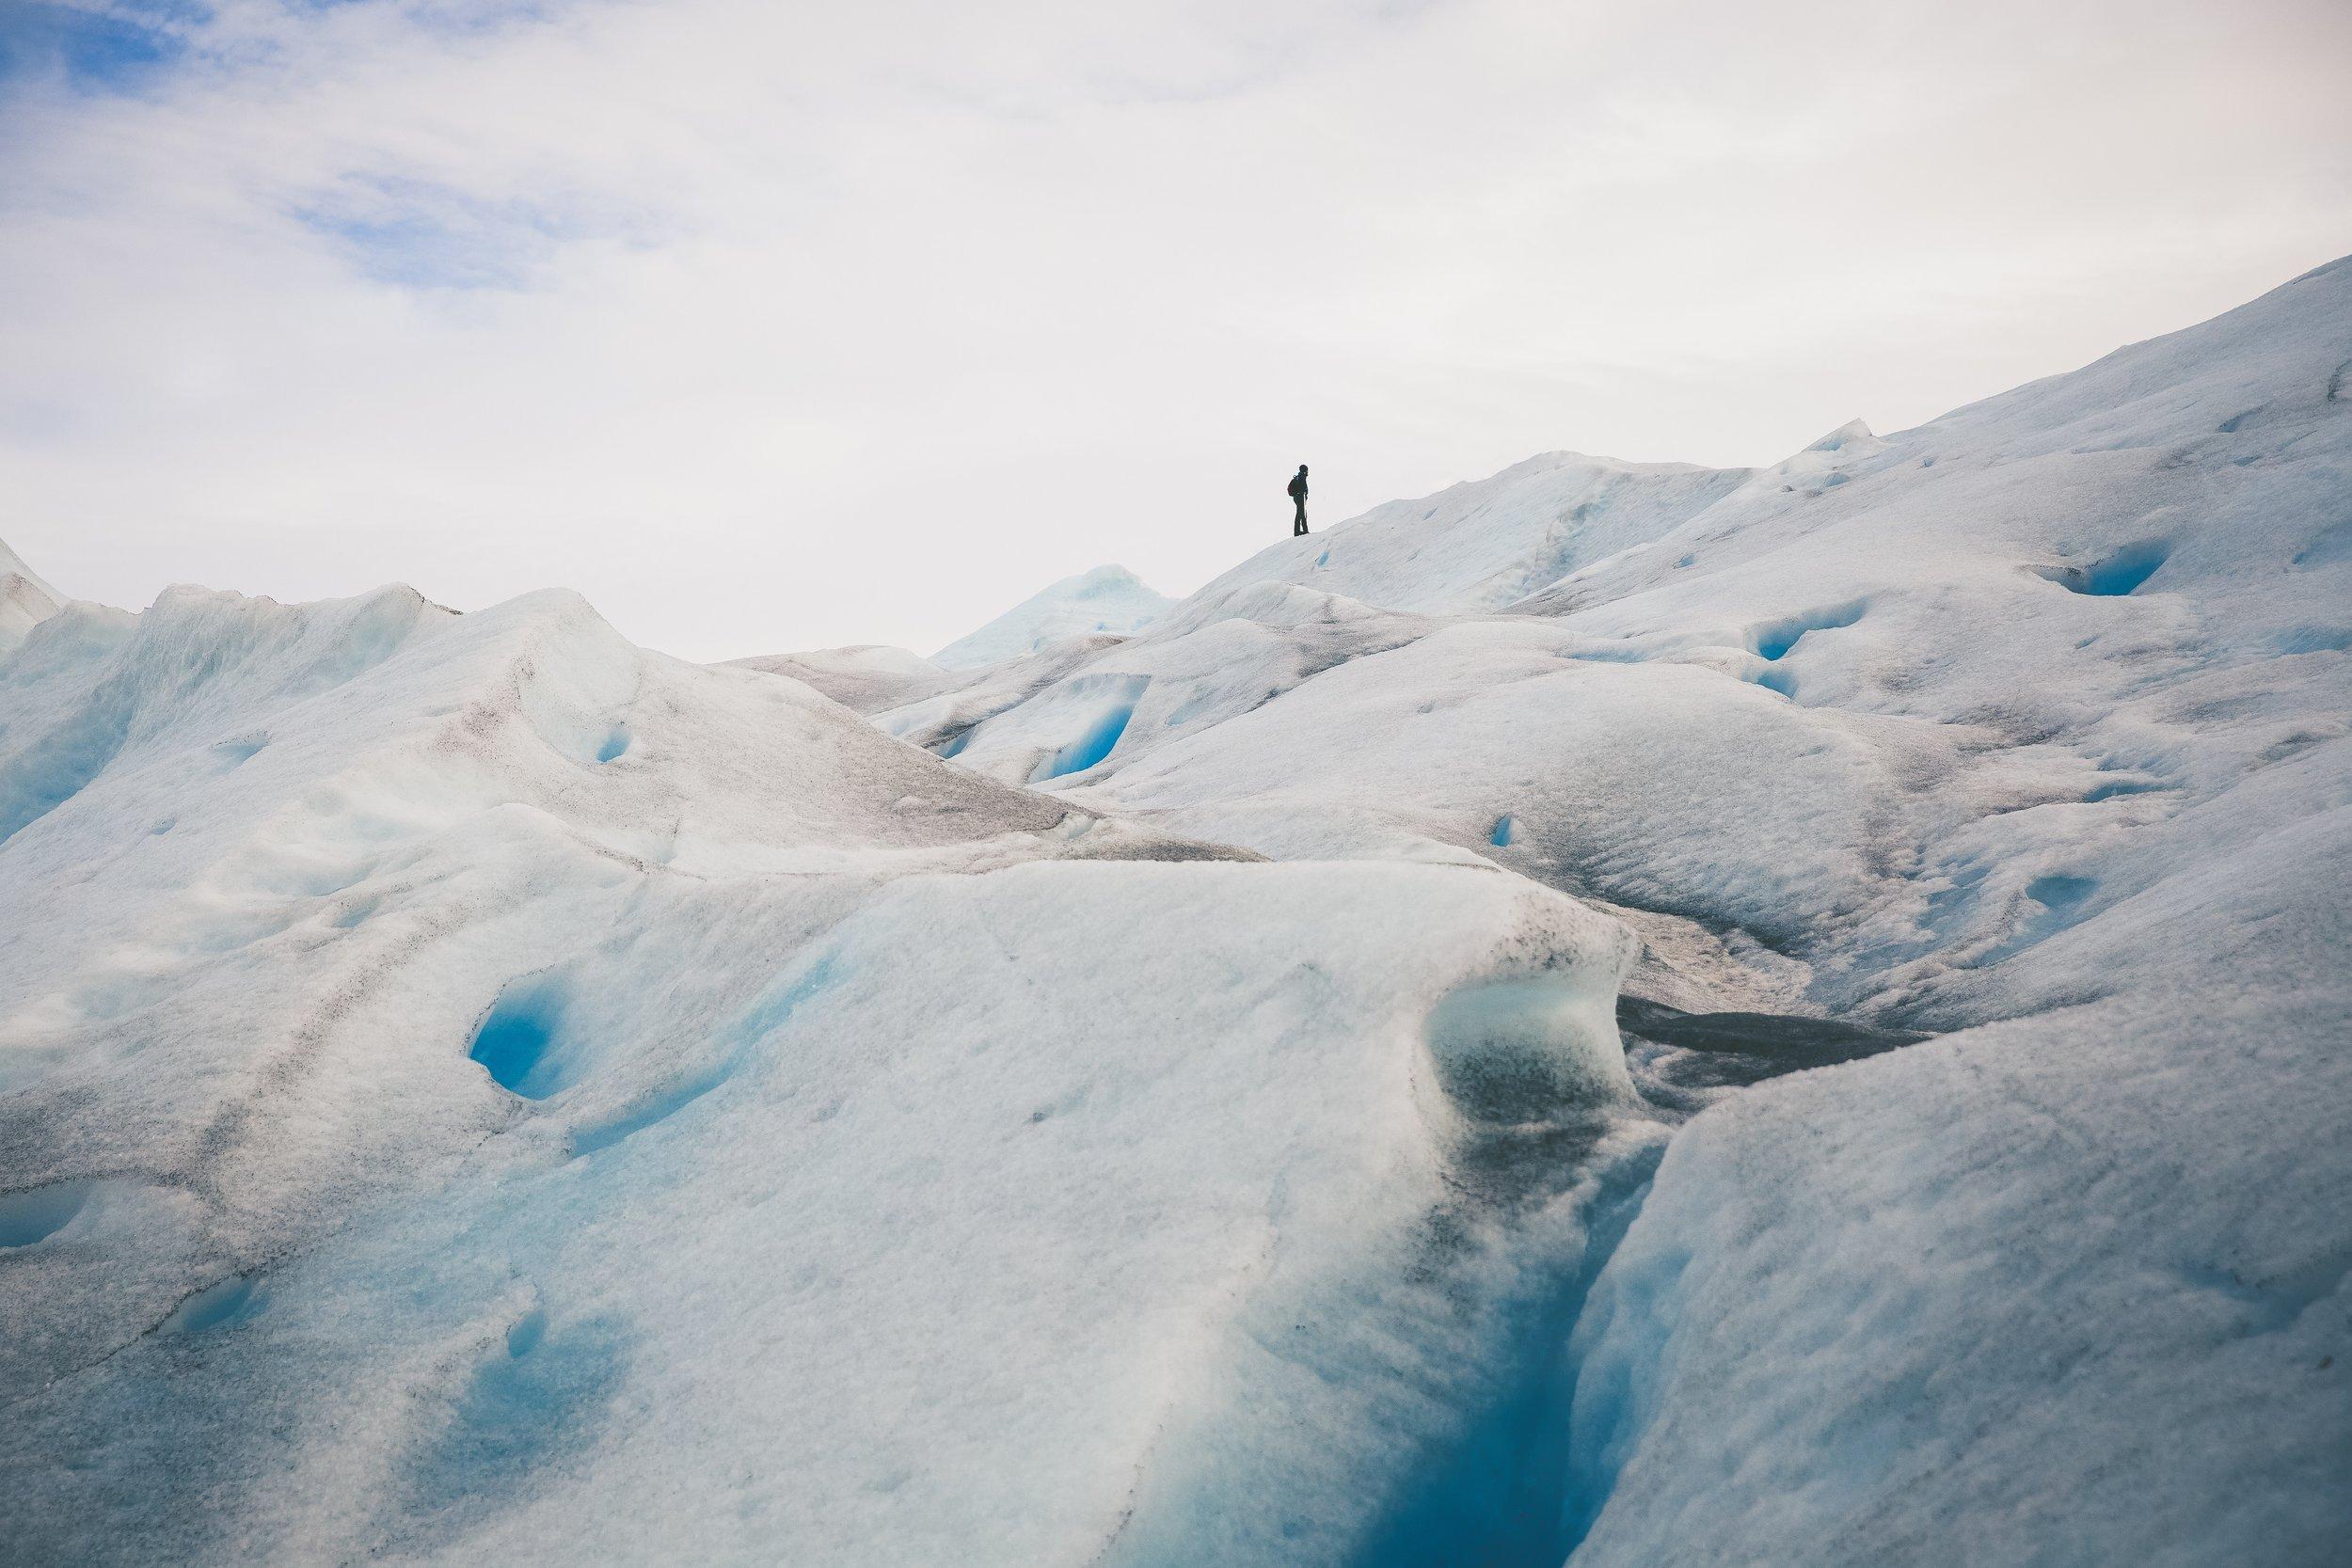 Patagonia, Argentina. From Unsplash, Margo Brodowicz.